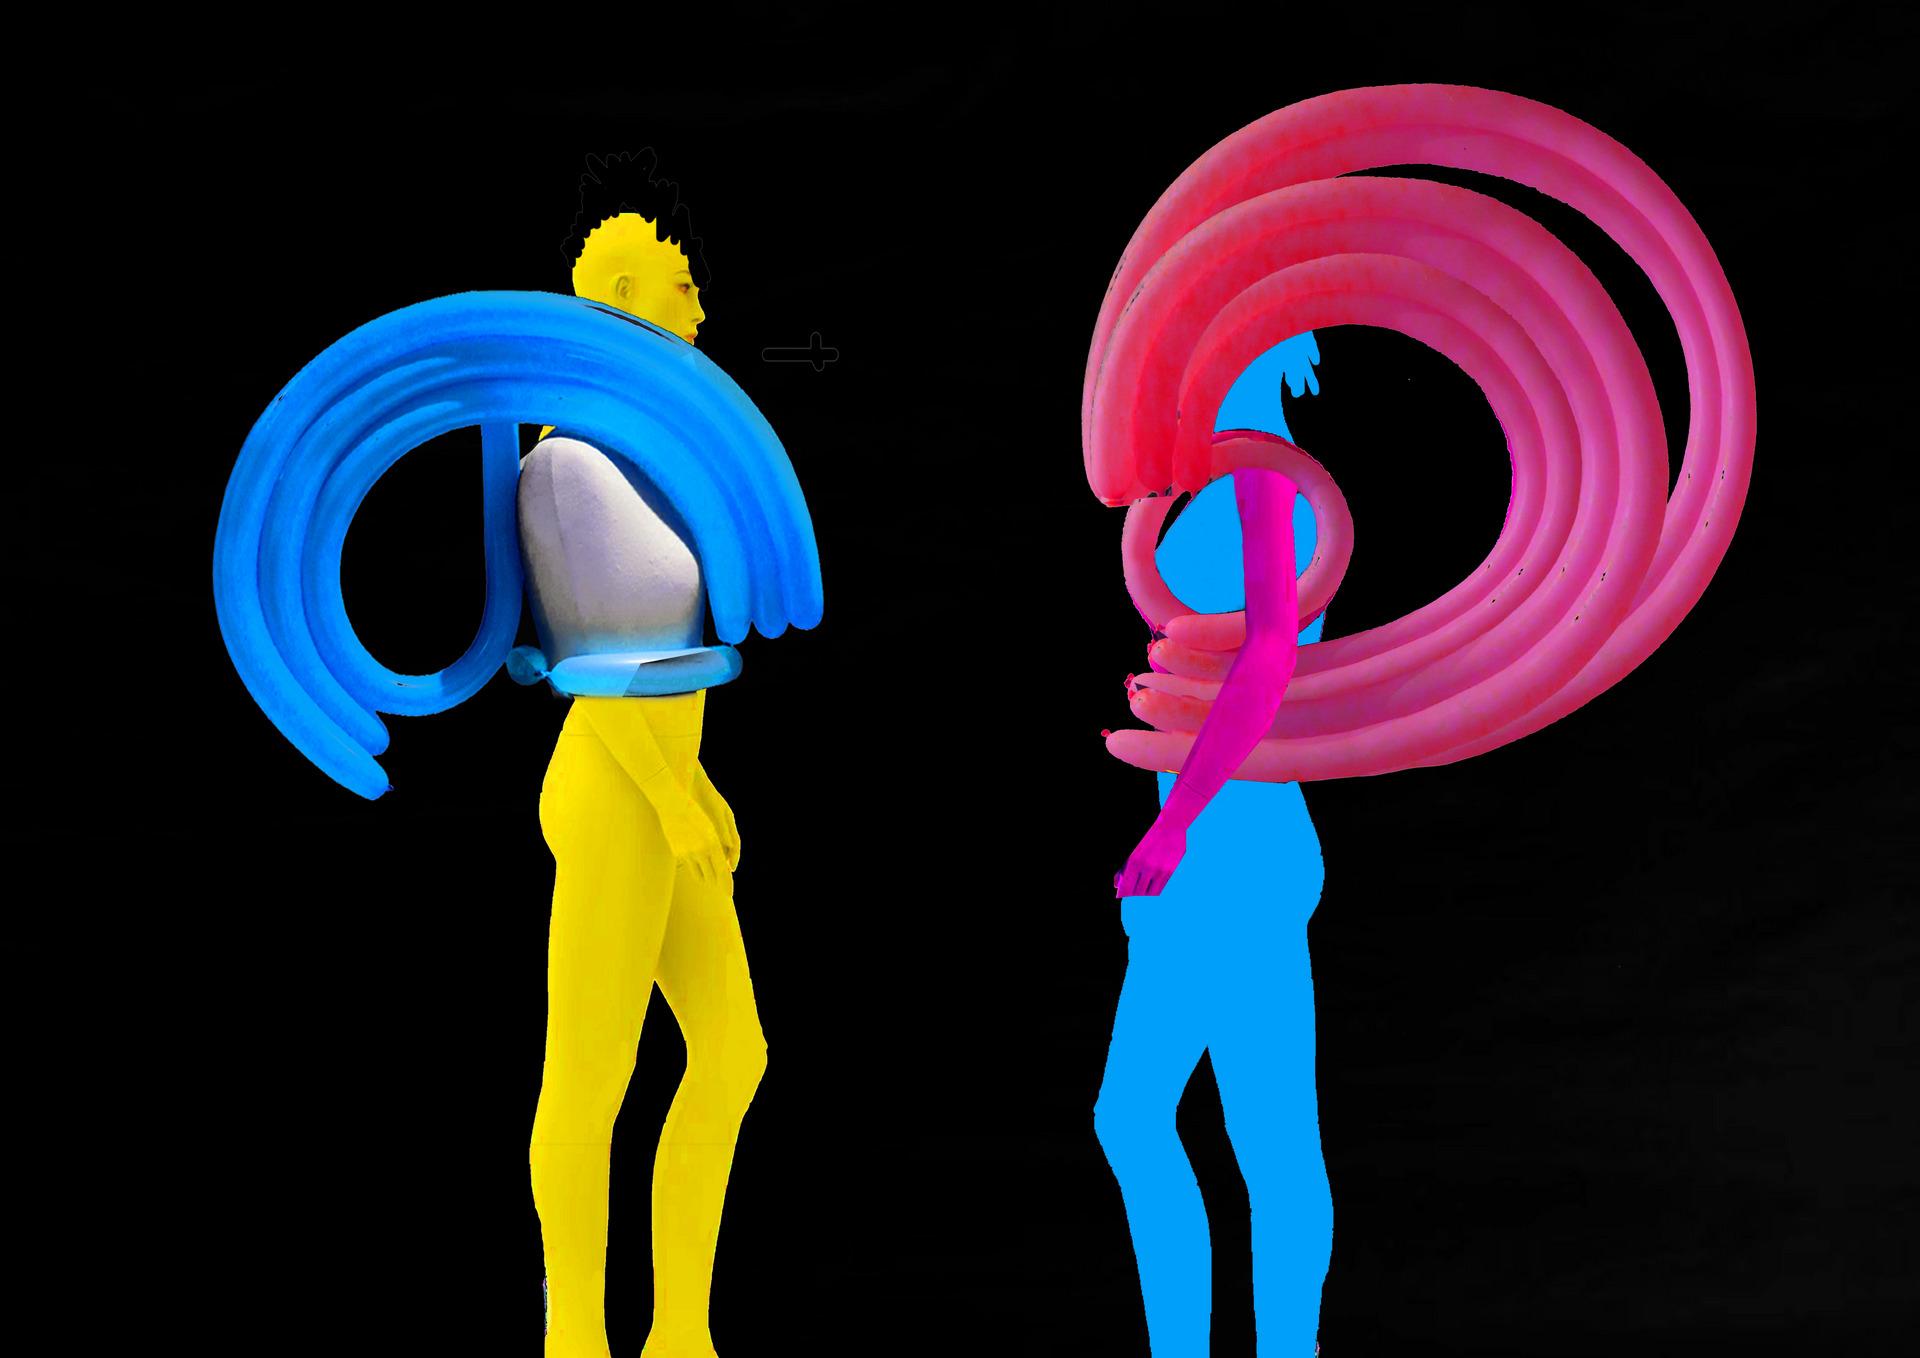 Initial design development ideas using latex balloons.